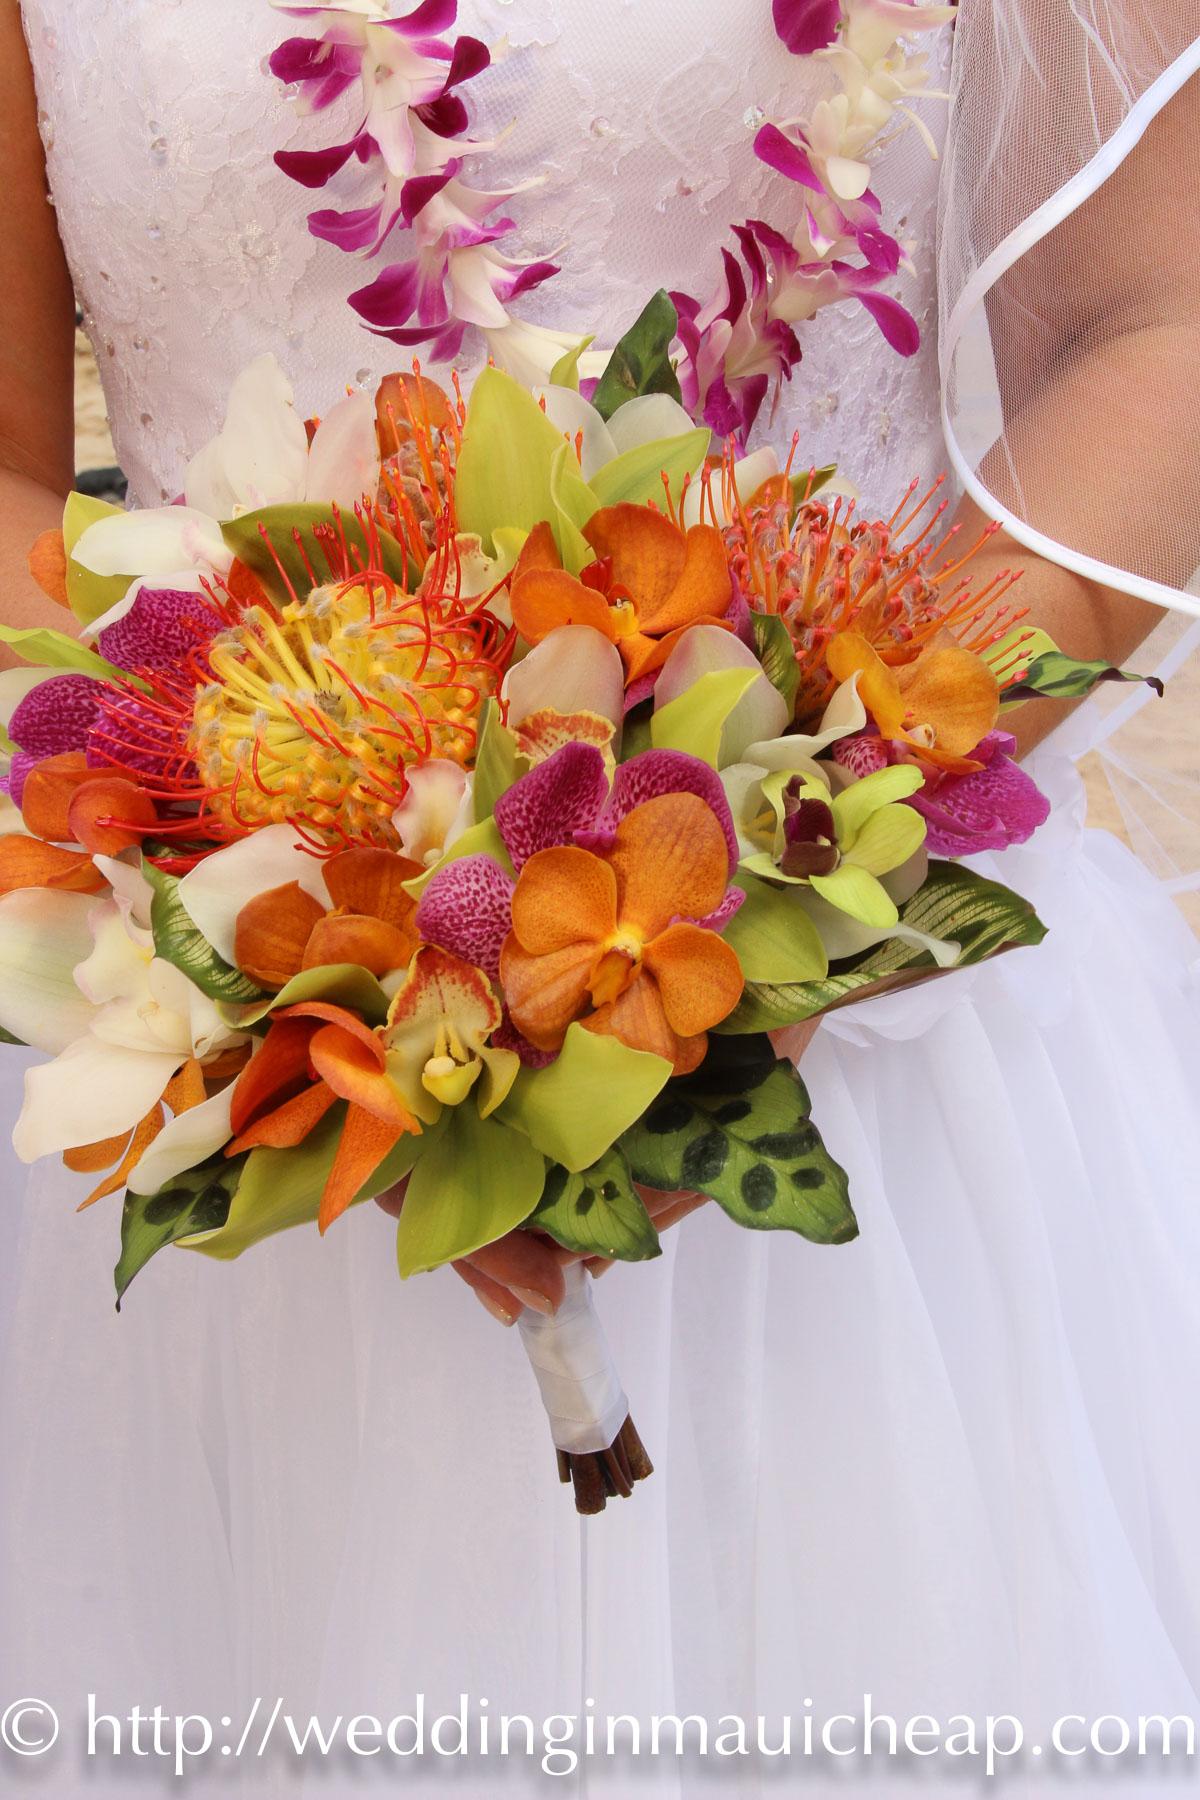 Cheap maui wedding flower affordable barefoot maui wedding cheap maui wedding flower izmirmasajfo